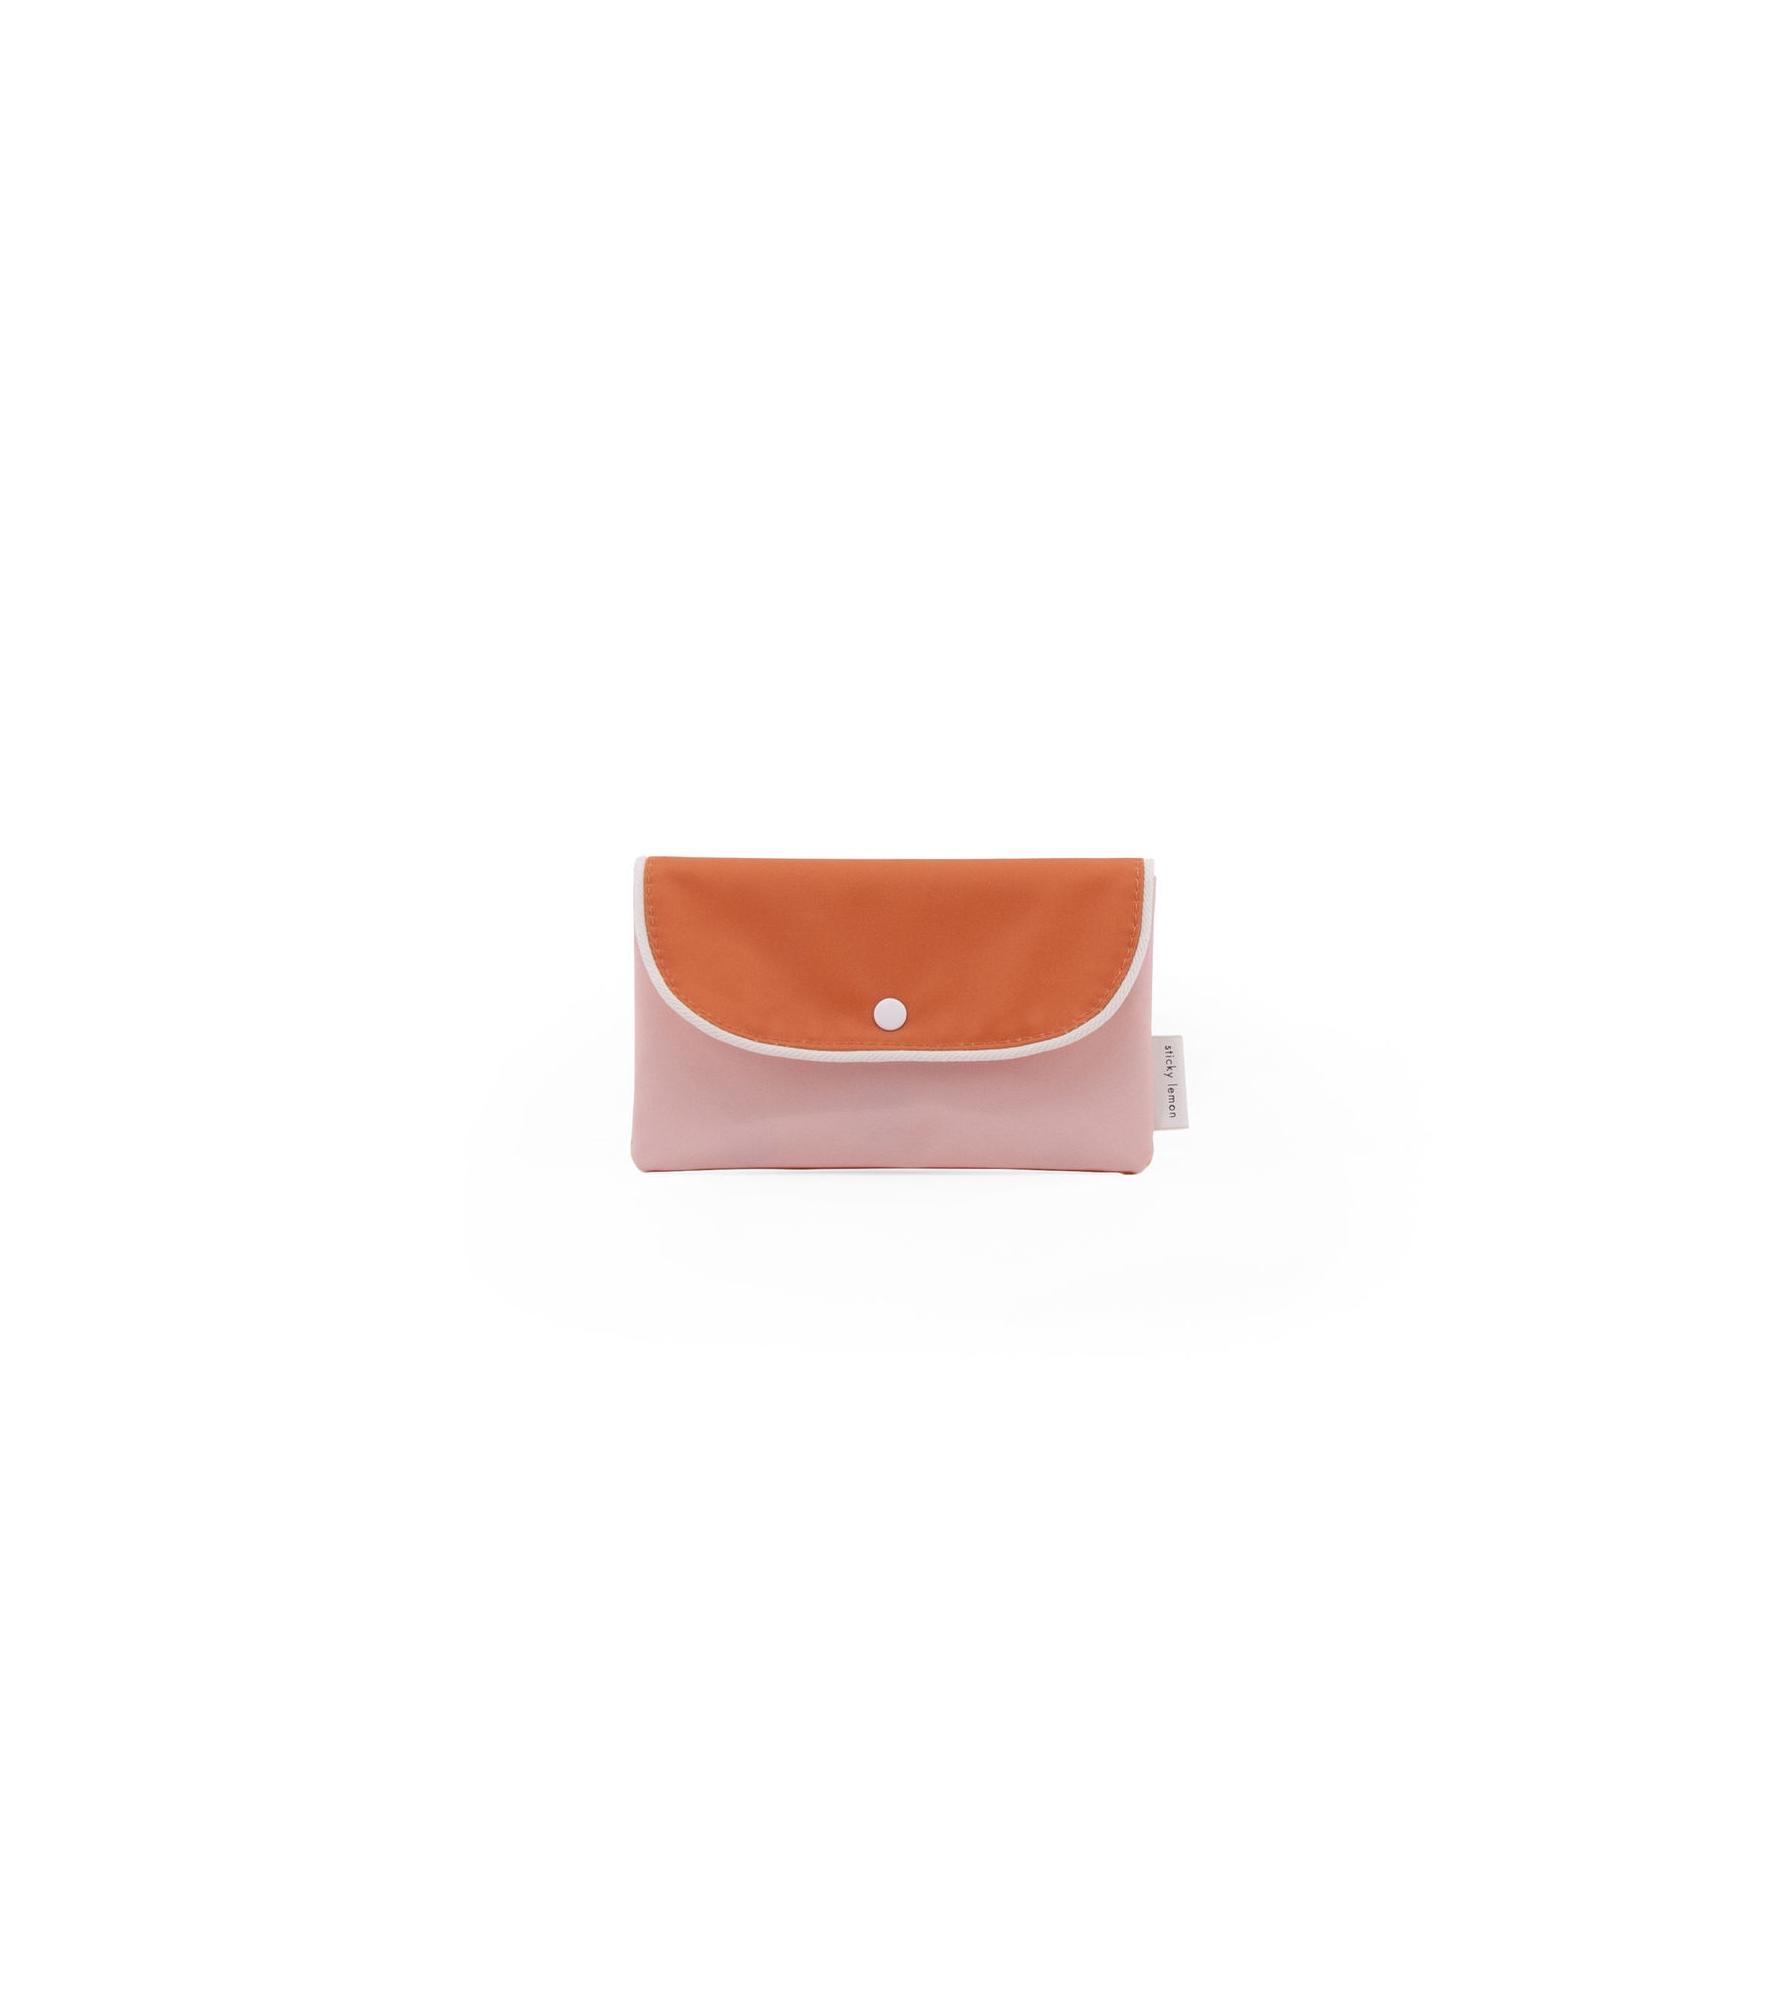 1801671_â___Sticky_Lemon_-_wanderer_-_pencil_case_-_candy_pink_+_carrot_orange_+_sunny_yellow_-_fr.jpg